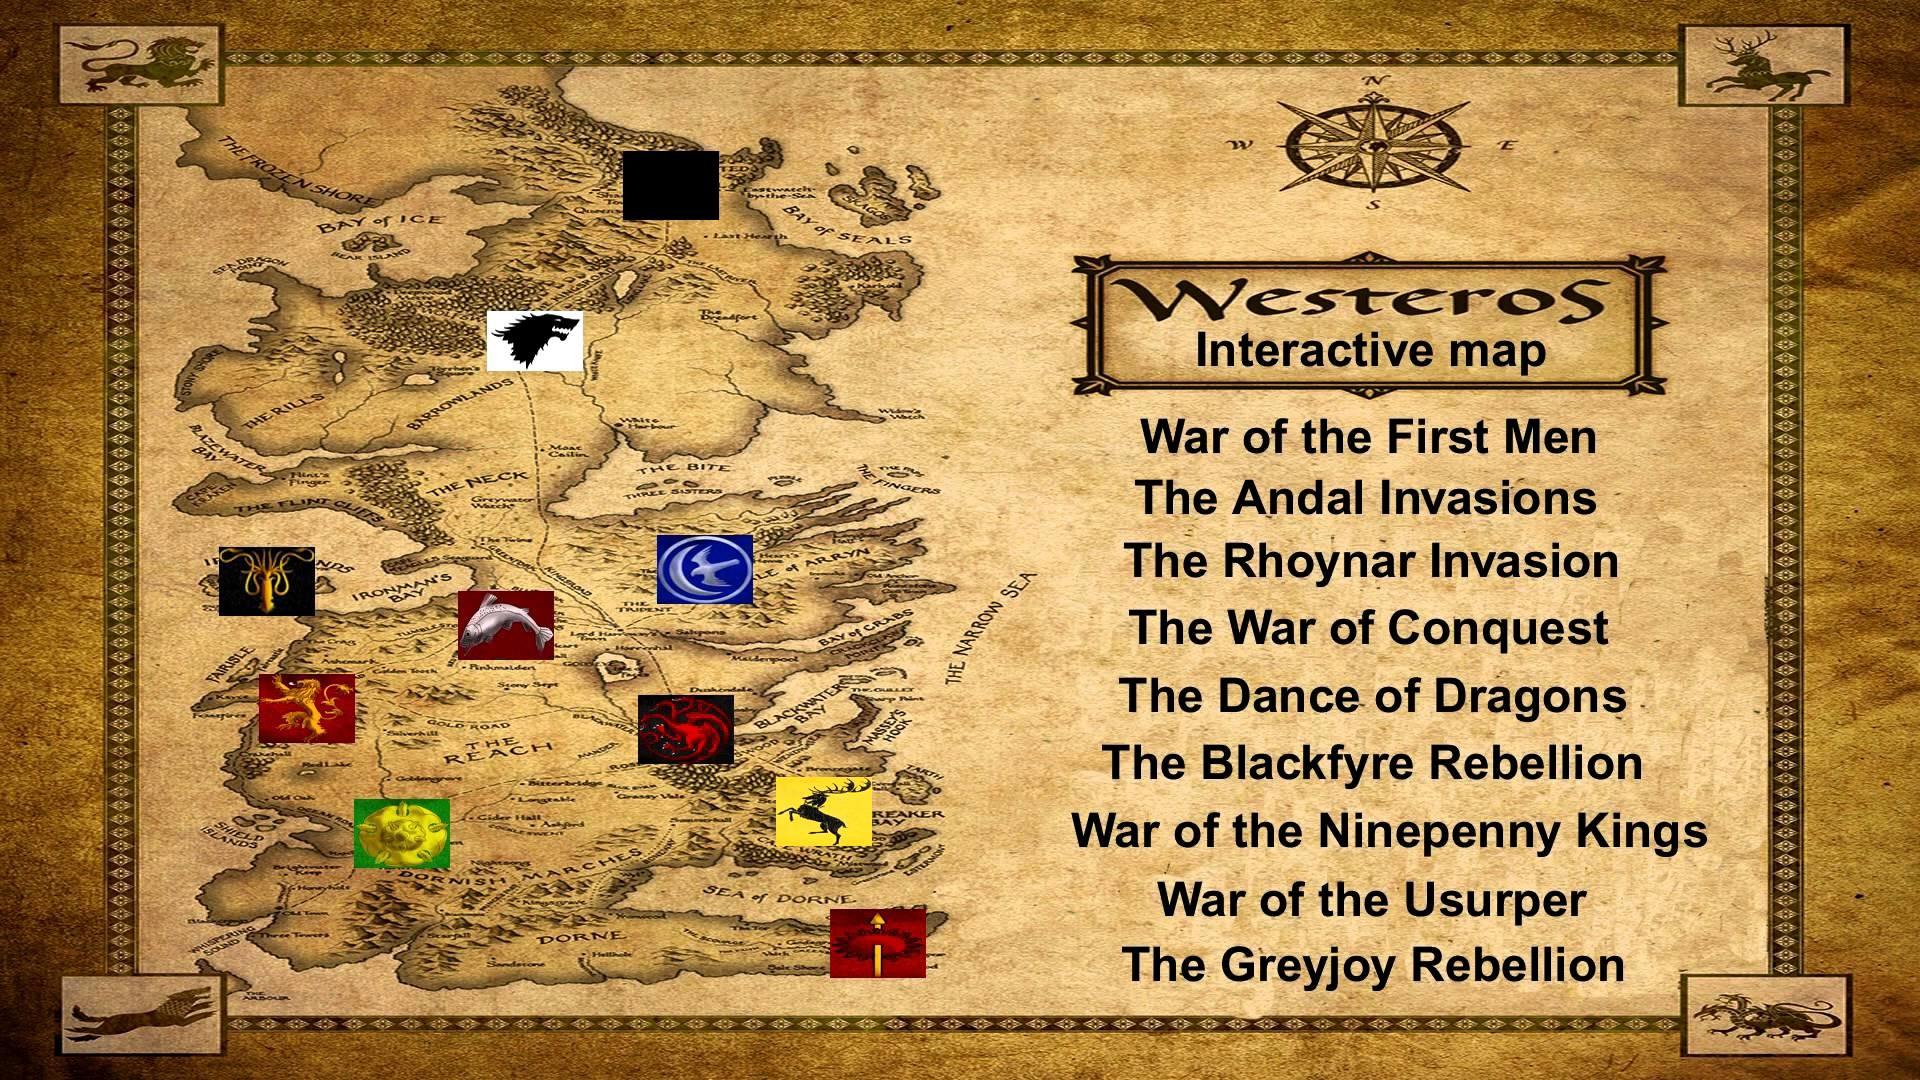 Westeros Lore: Interactive Map